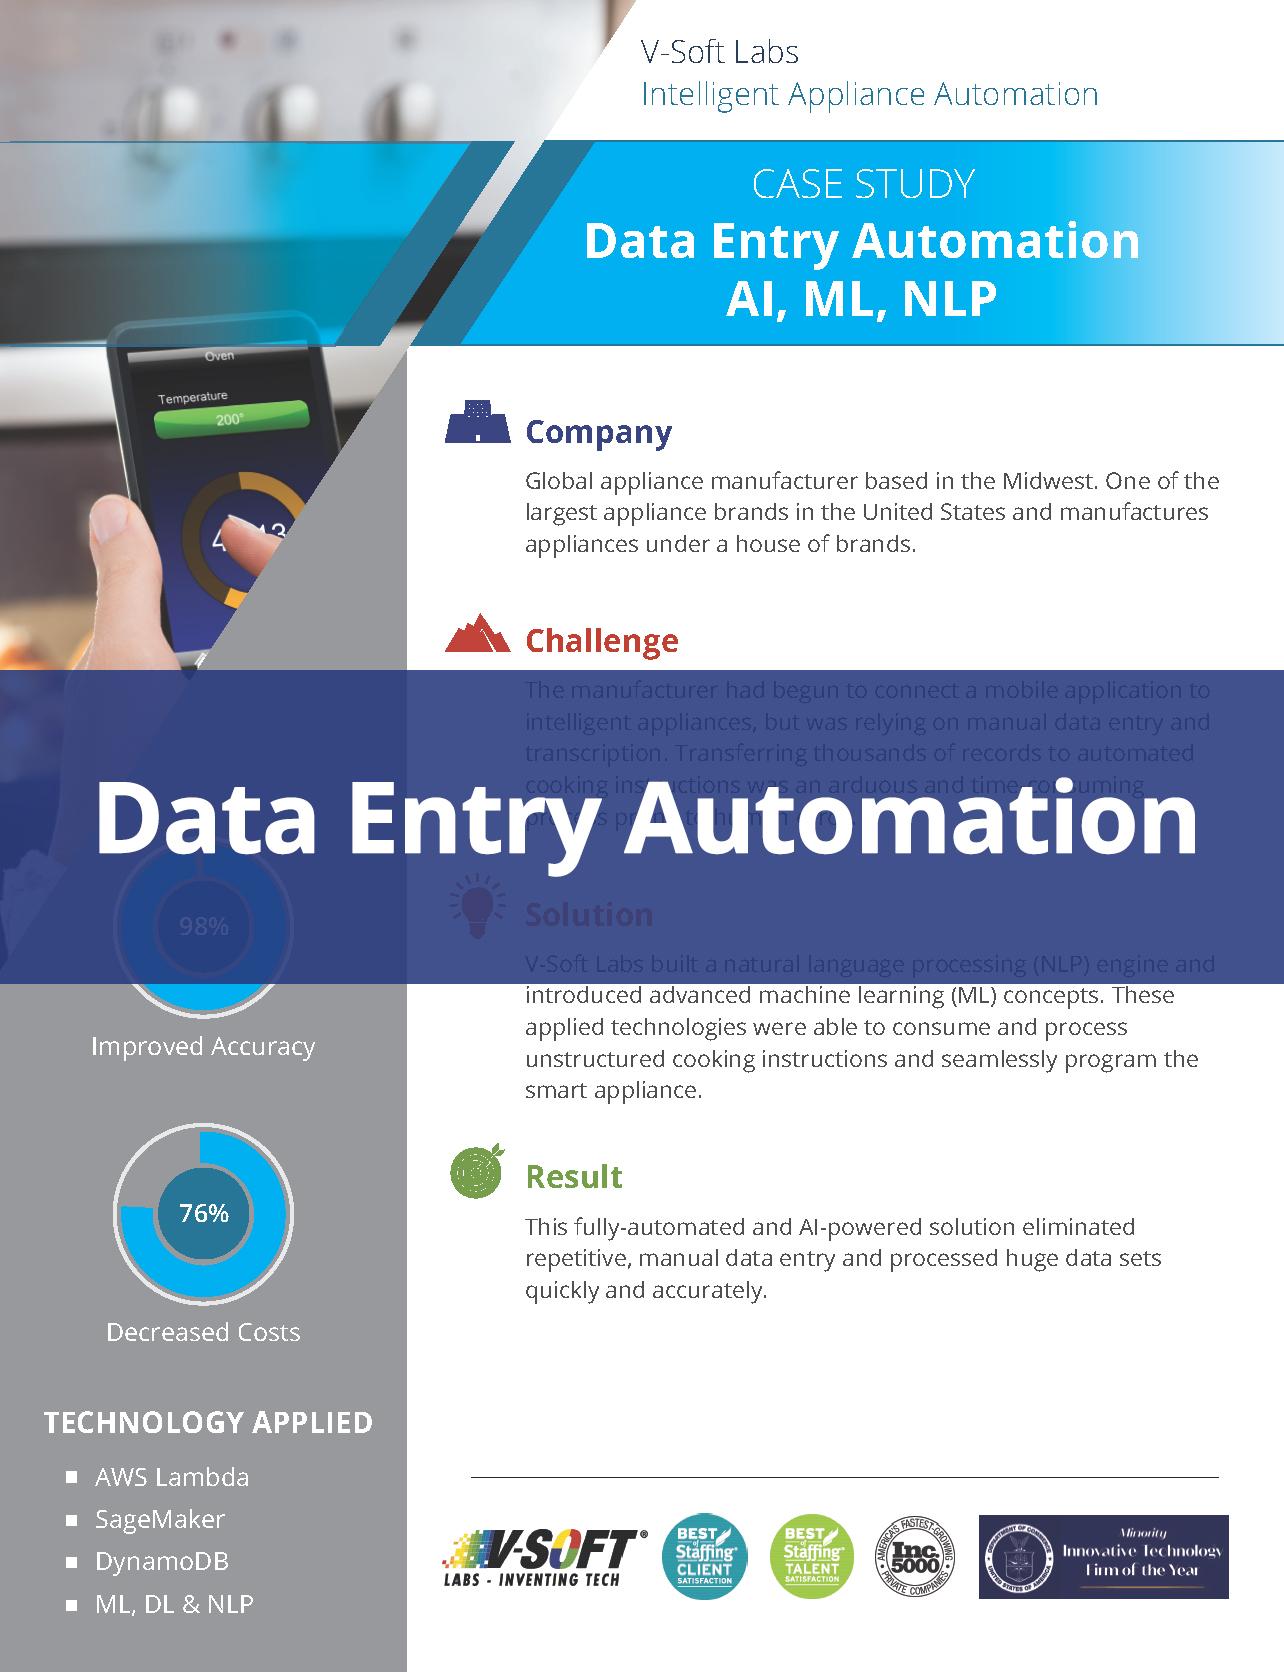 Intelligent Appliance Automation